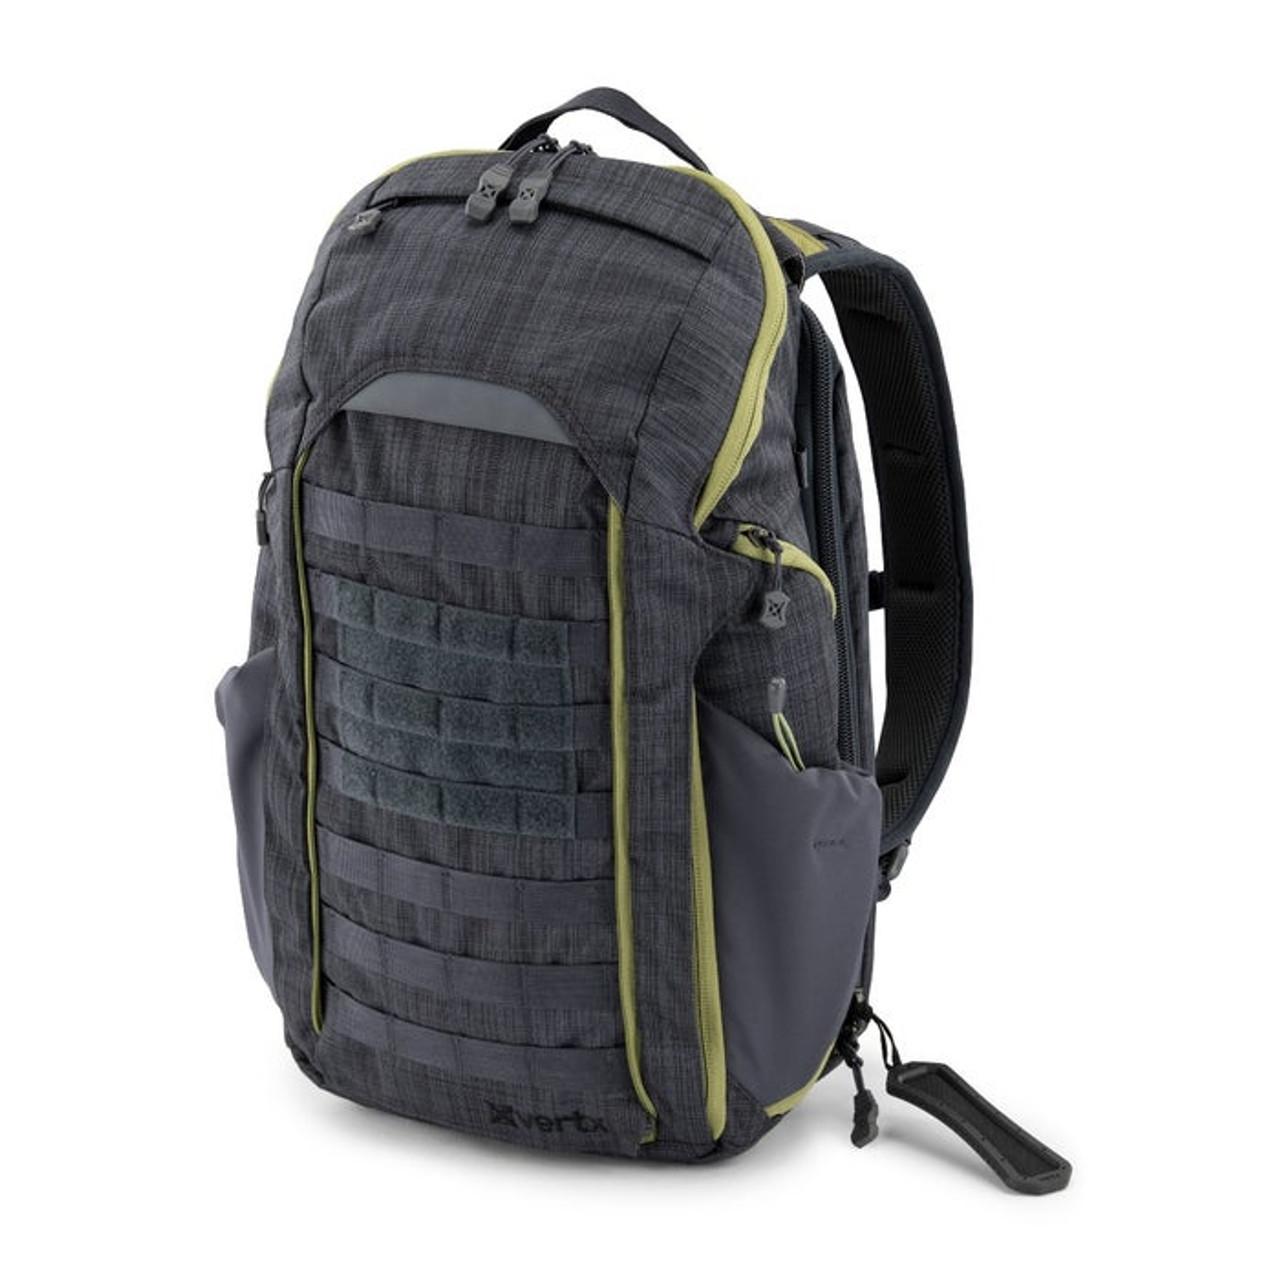 Vertx Gamut 2.0 Backpack (Heather Black / Mustard Grass)